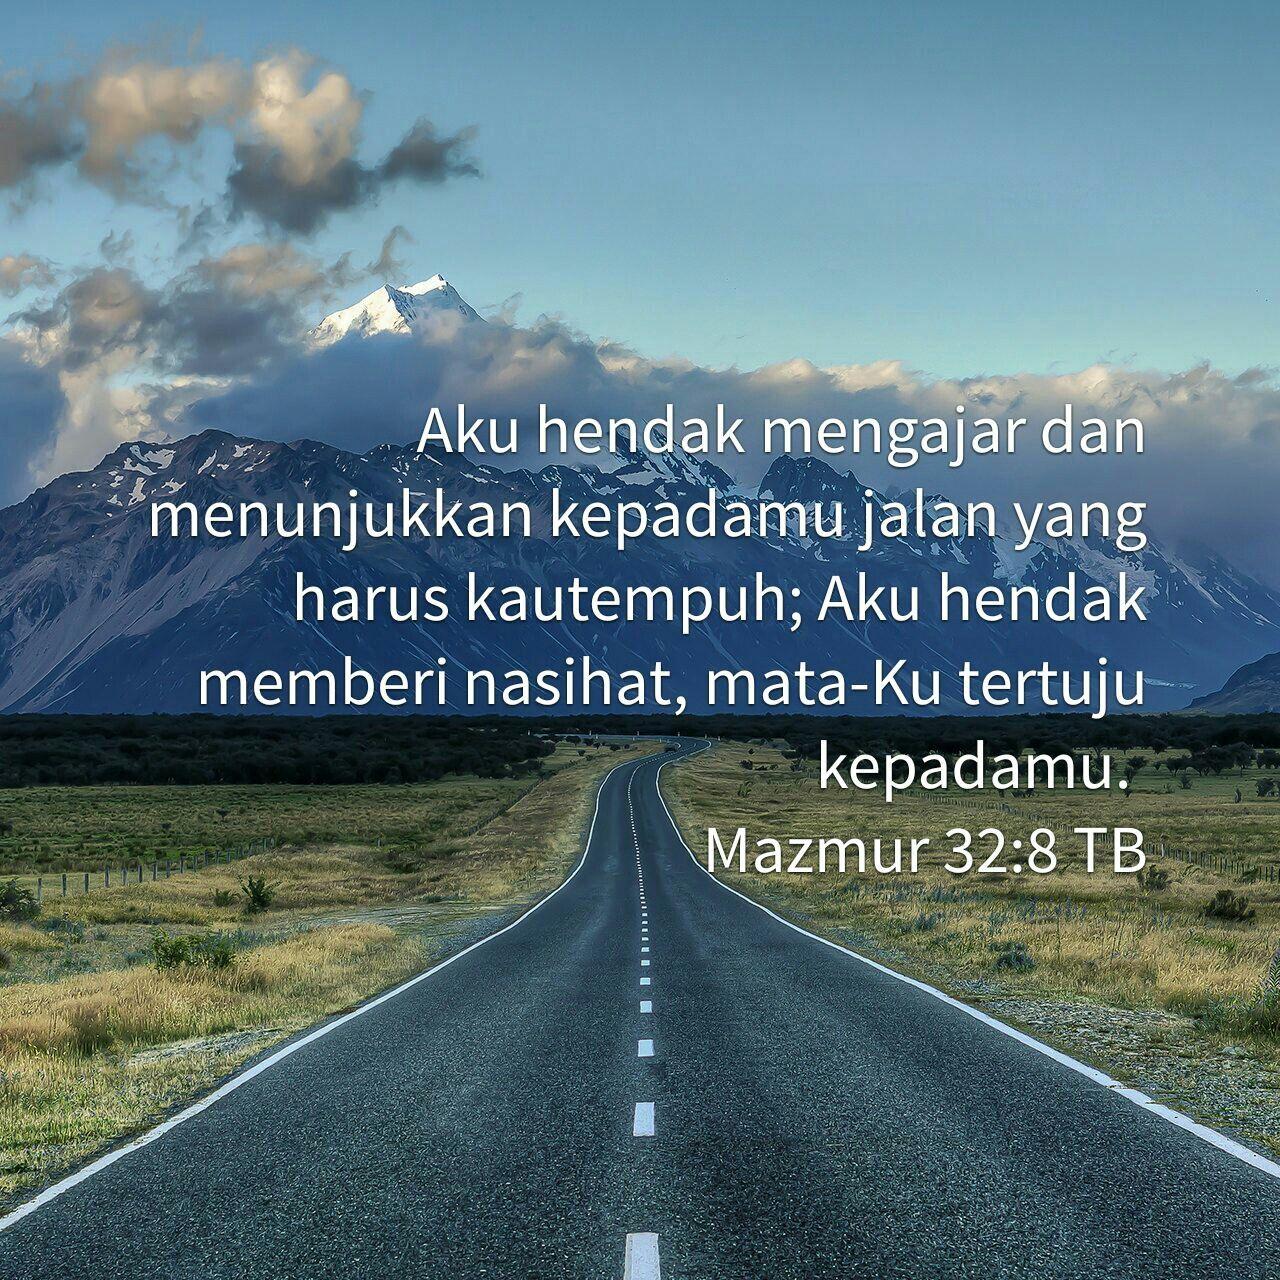 Psalm 32 8 In Bahasa Indonesia Mazmur Amsal Alkitab